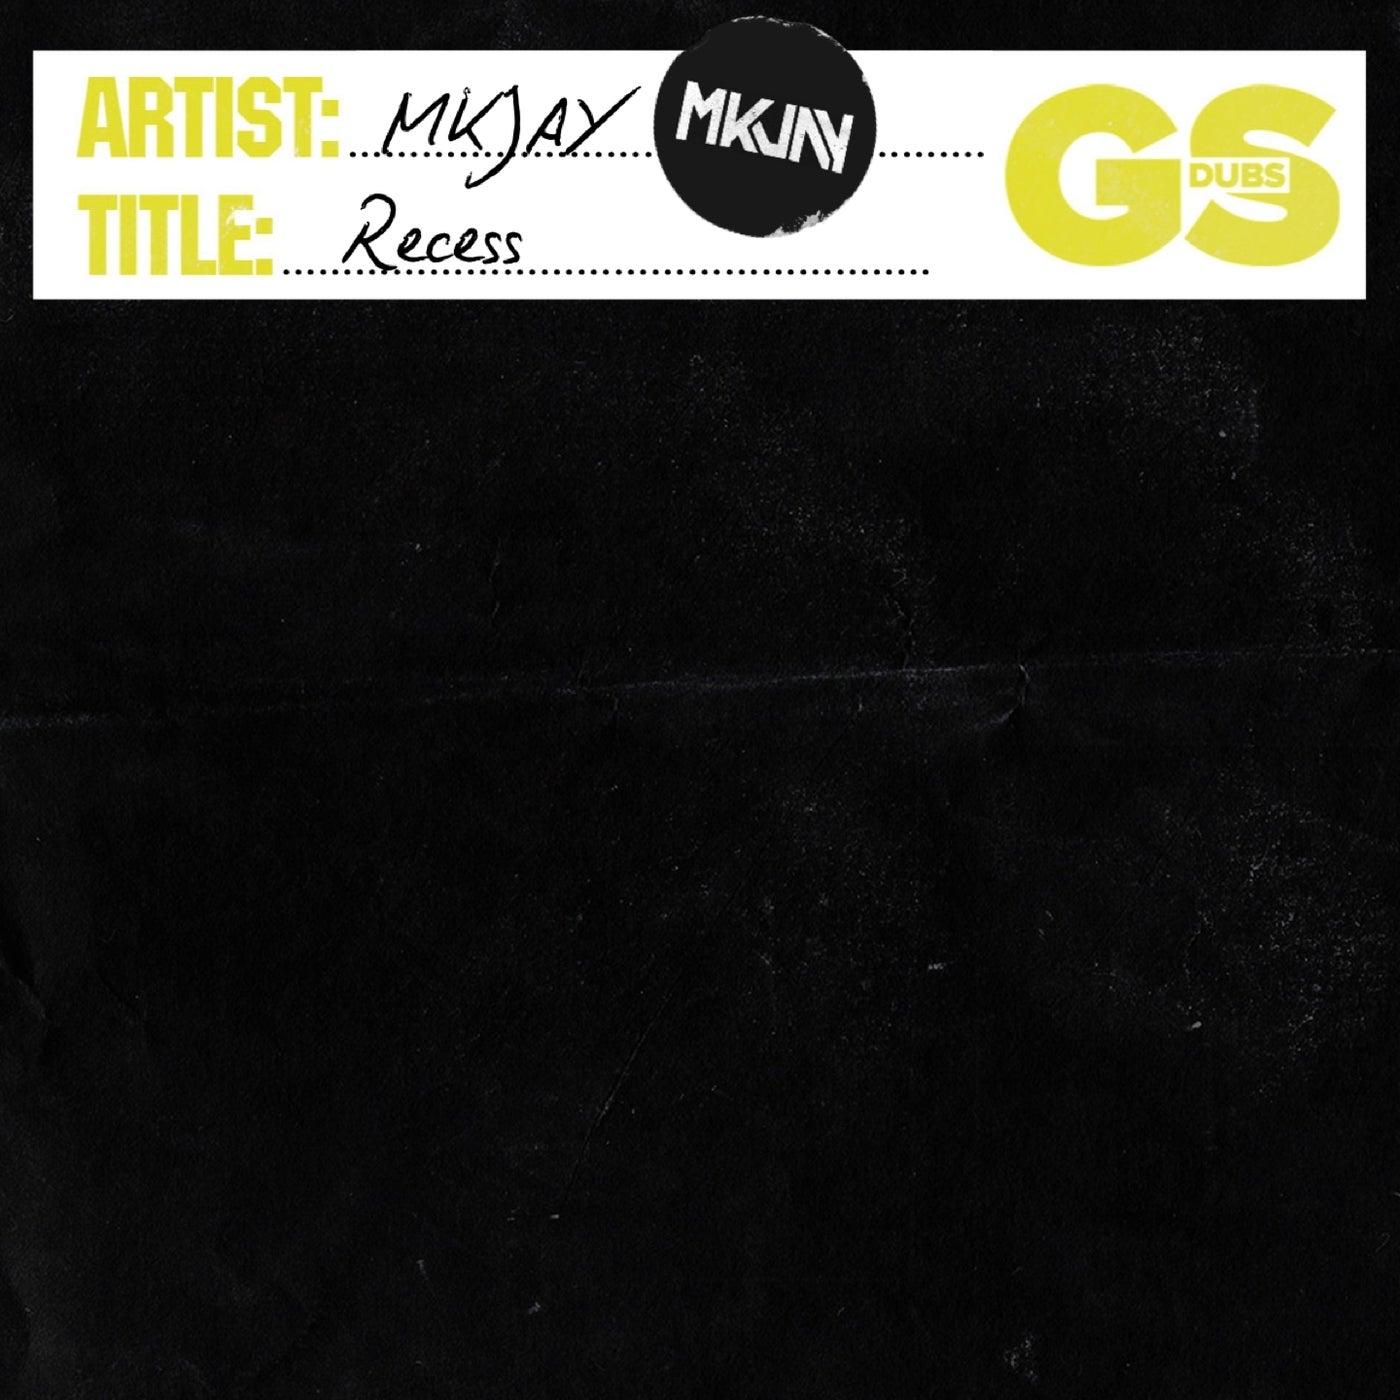 Recess (Original Mix)